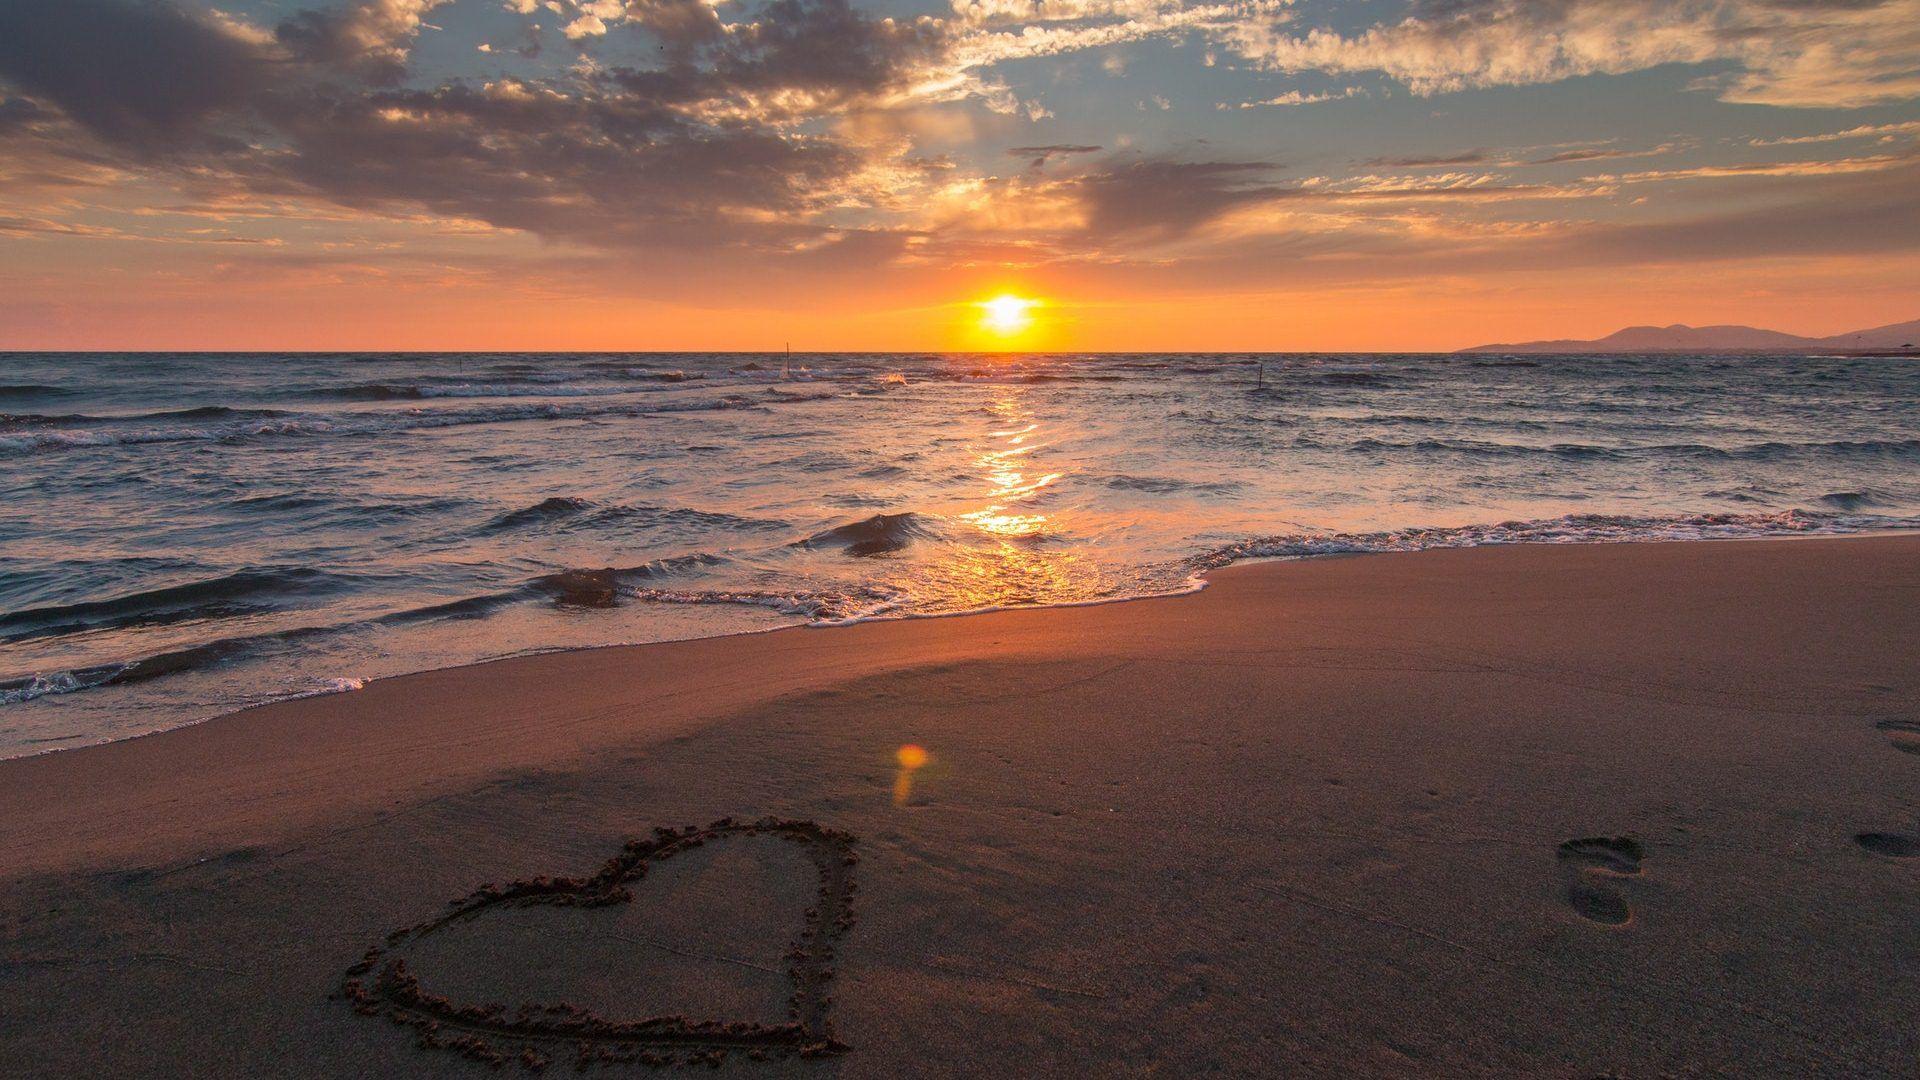 Love Sunset Hd Wallpapers 1080p Sunset Hd Wallpaper 1080p 1920x1080 Wallpaper Teahub Io